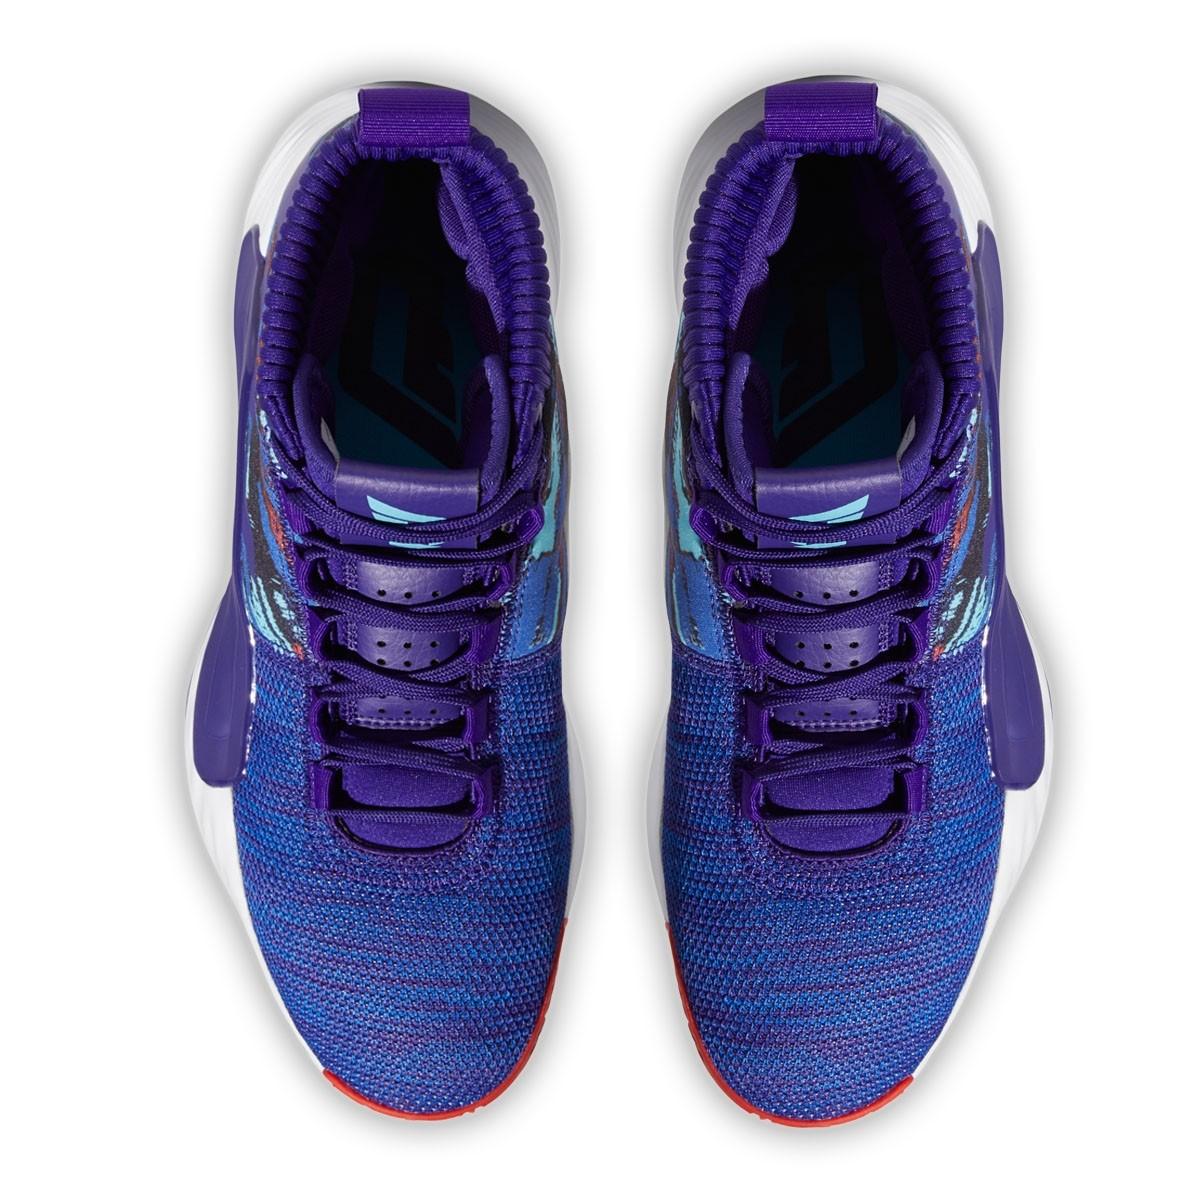 ADIDAS Dame 5 Jr 'Purple Royal'EF0500-Jr